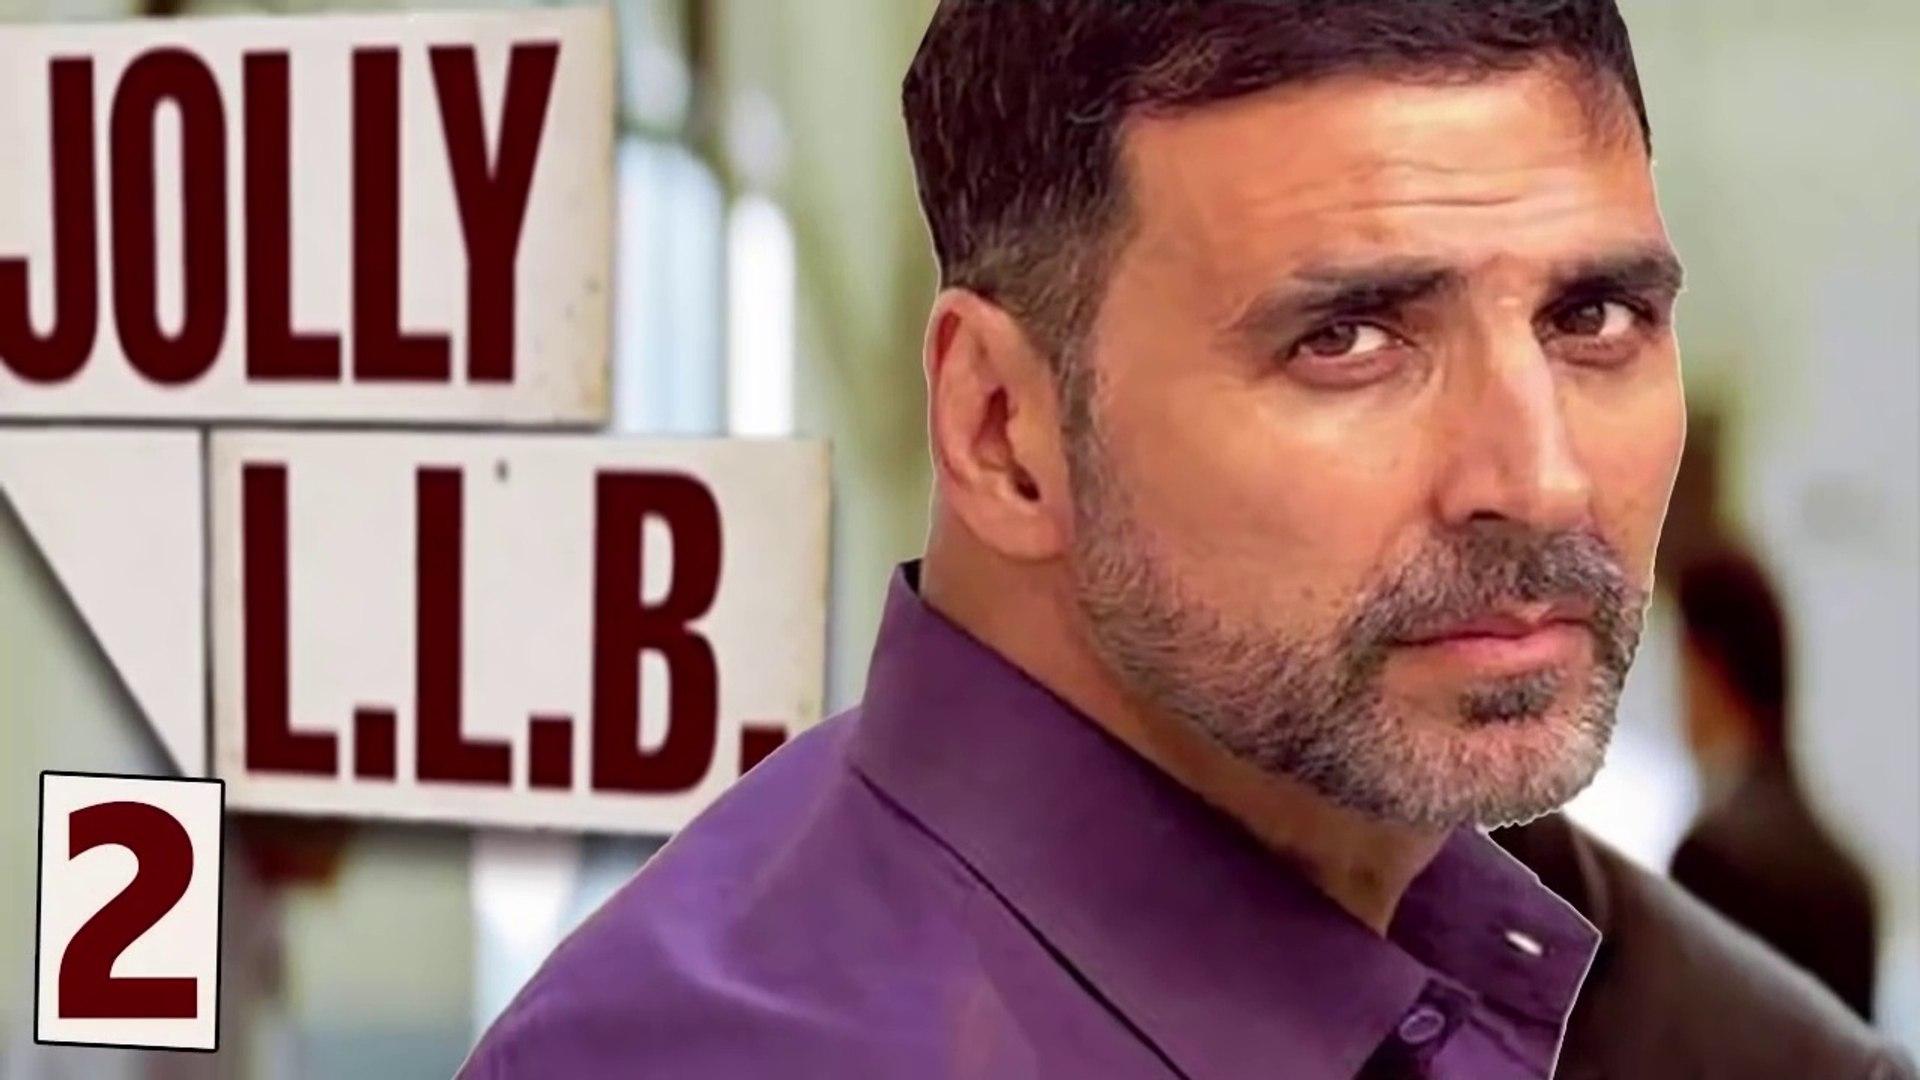 Jolly LLB 2 - Jolly LLB 2 Official Movie Trailer - Akshay Kumar - Huma Qureshi - Fanmade, Unofficial